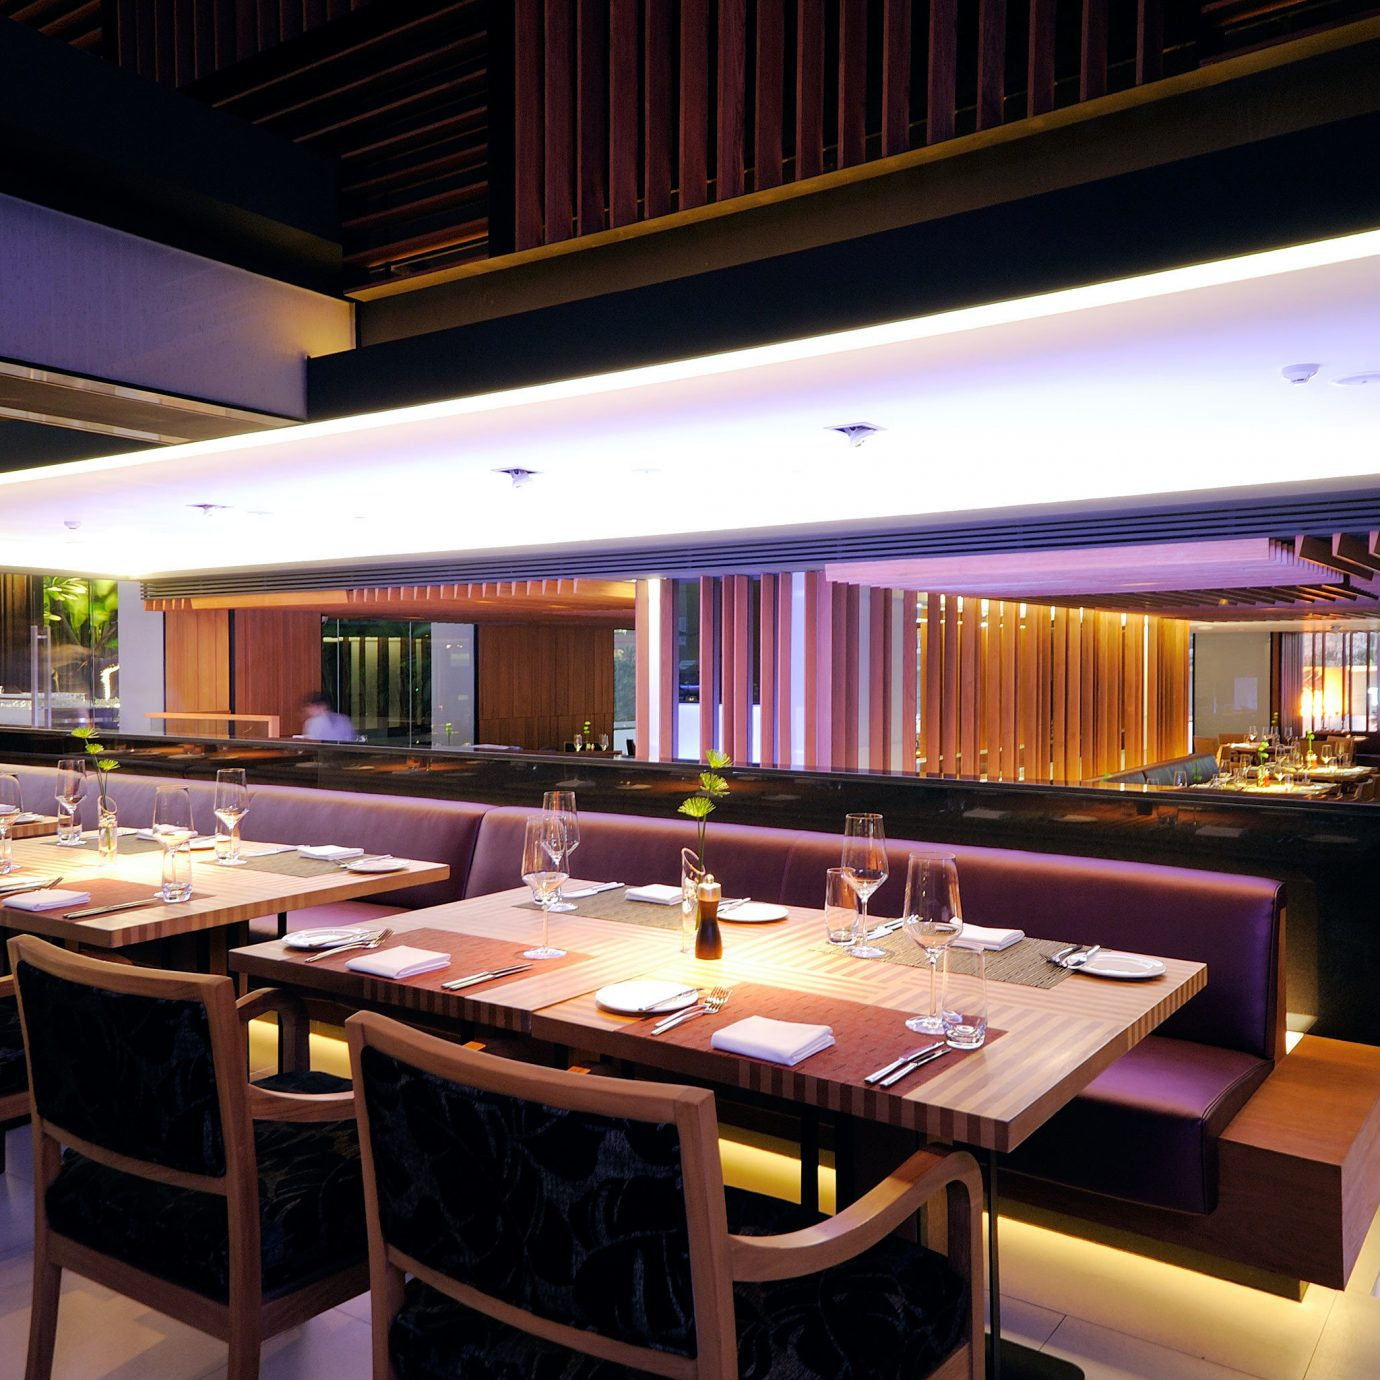 Bar Dining Drink Eat billiard room recreation room function hall restaurant Resort convention center Island